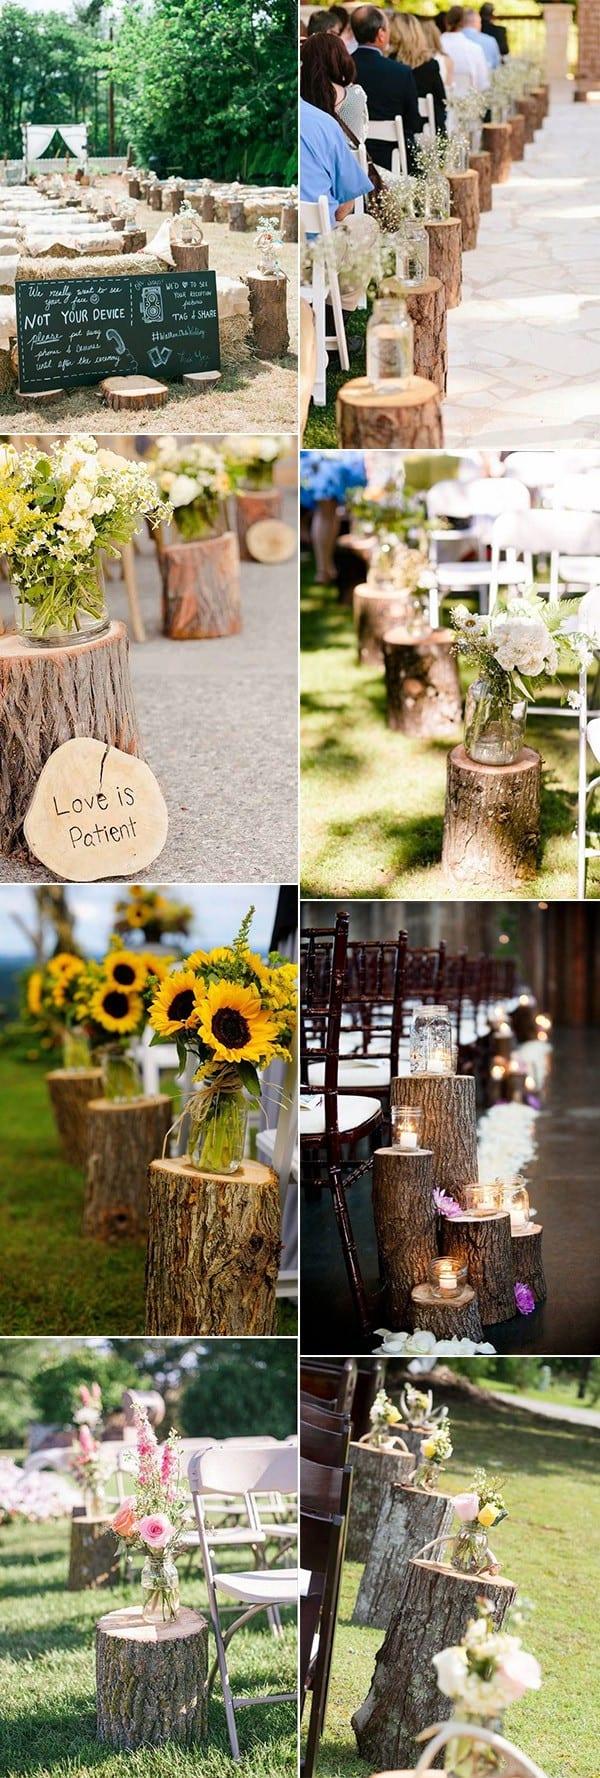 tree stump rustic country wedding idea